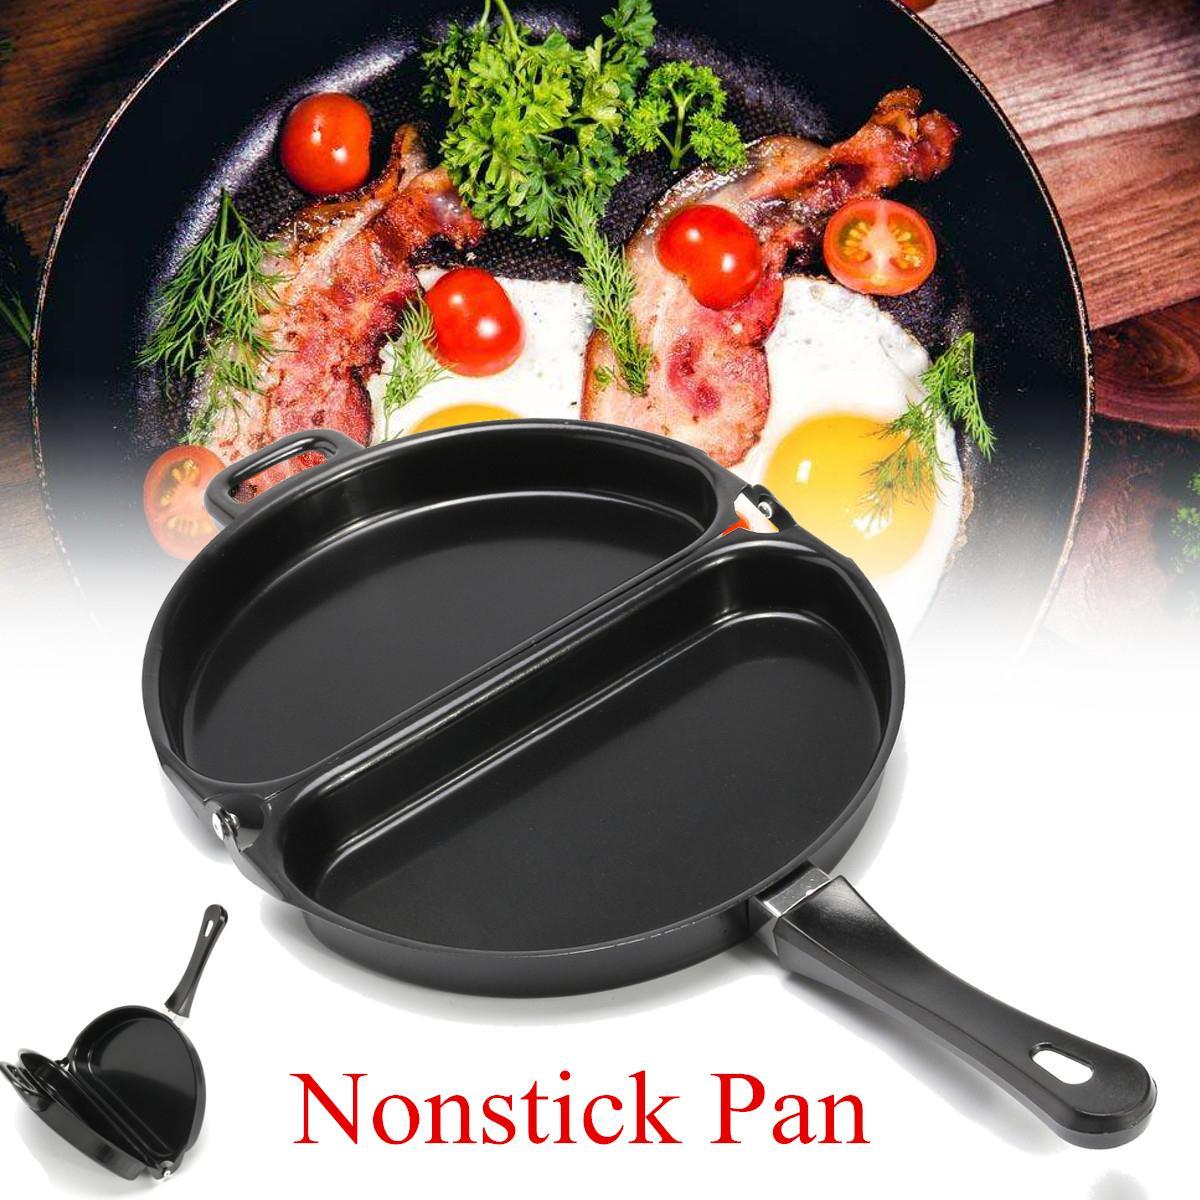 Titanium Steel Nonstick Omelet Pan Kitchen Breakfast Skillet Egg Frying Maker Portable Outdoor picnic BBQ Cooking tableware